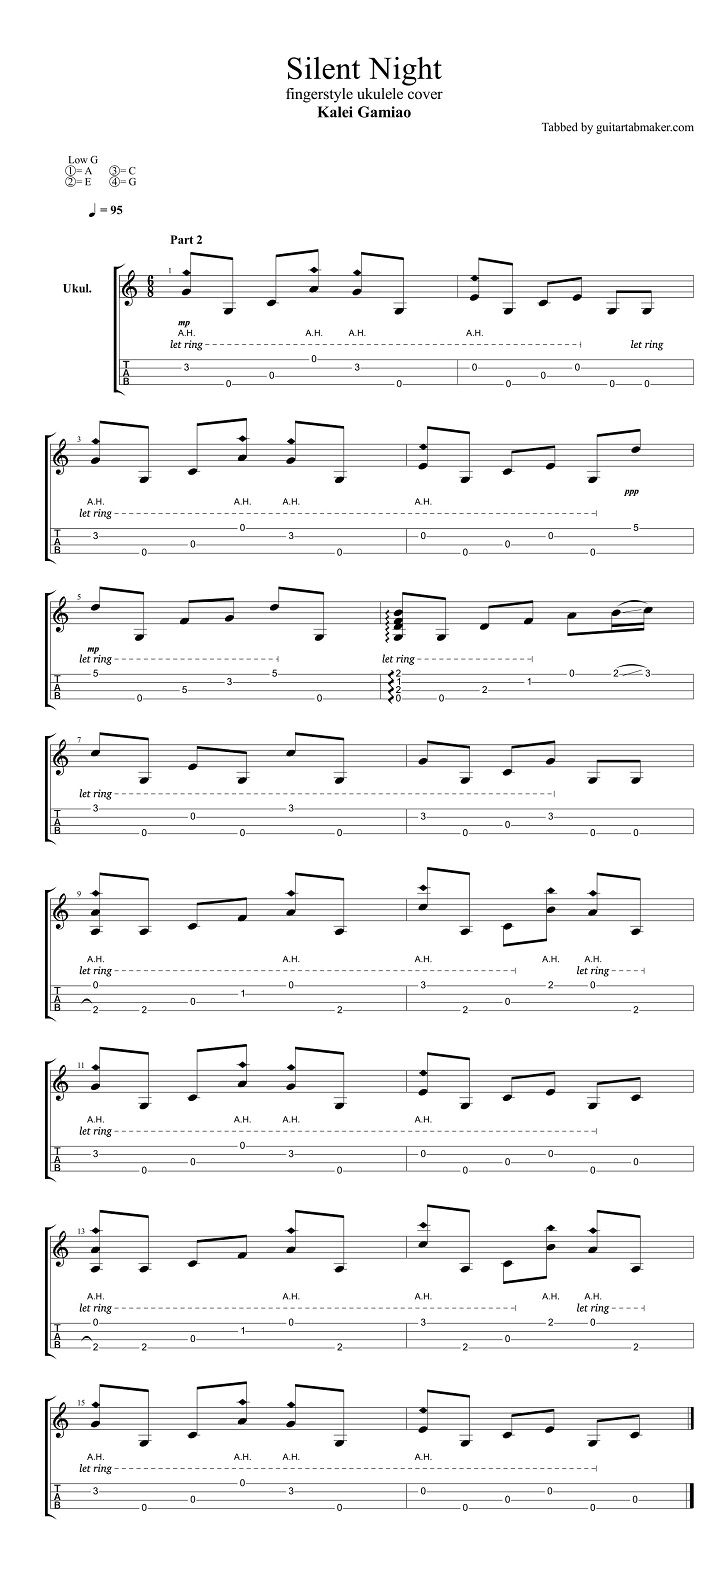 silent night fingerstyle ukulele tab pdf ukulele sheet music guitar pro tab download. Black Bedroom Furniture Sets. Home Design Ideas